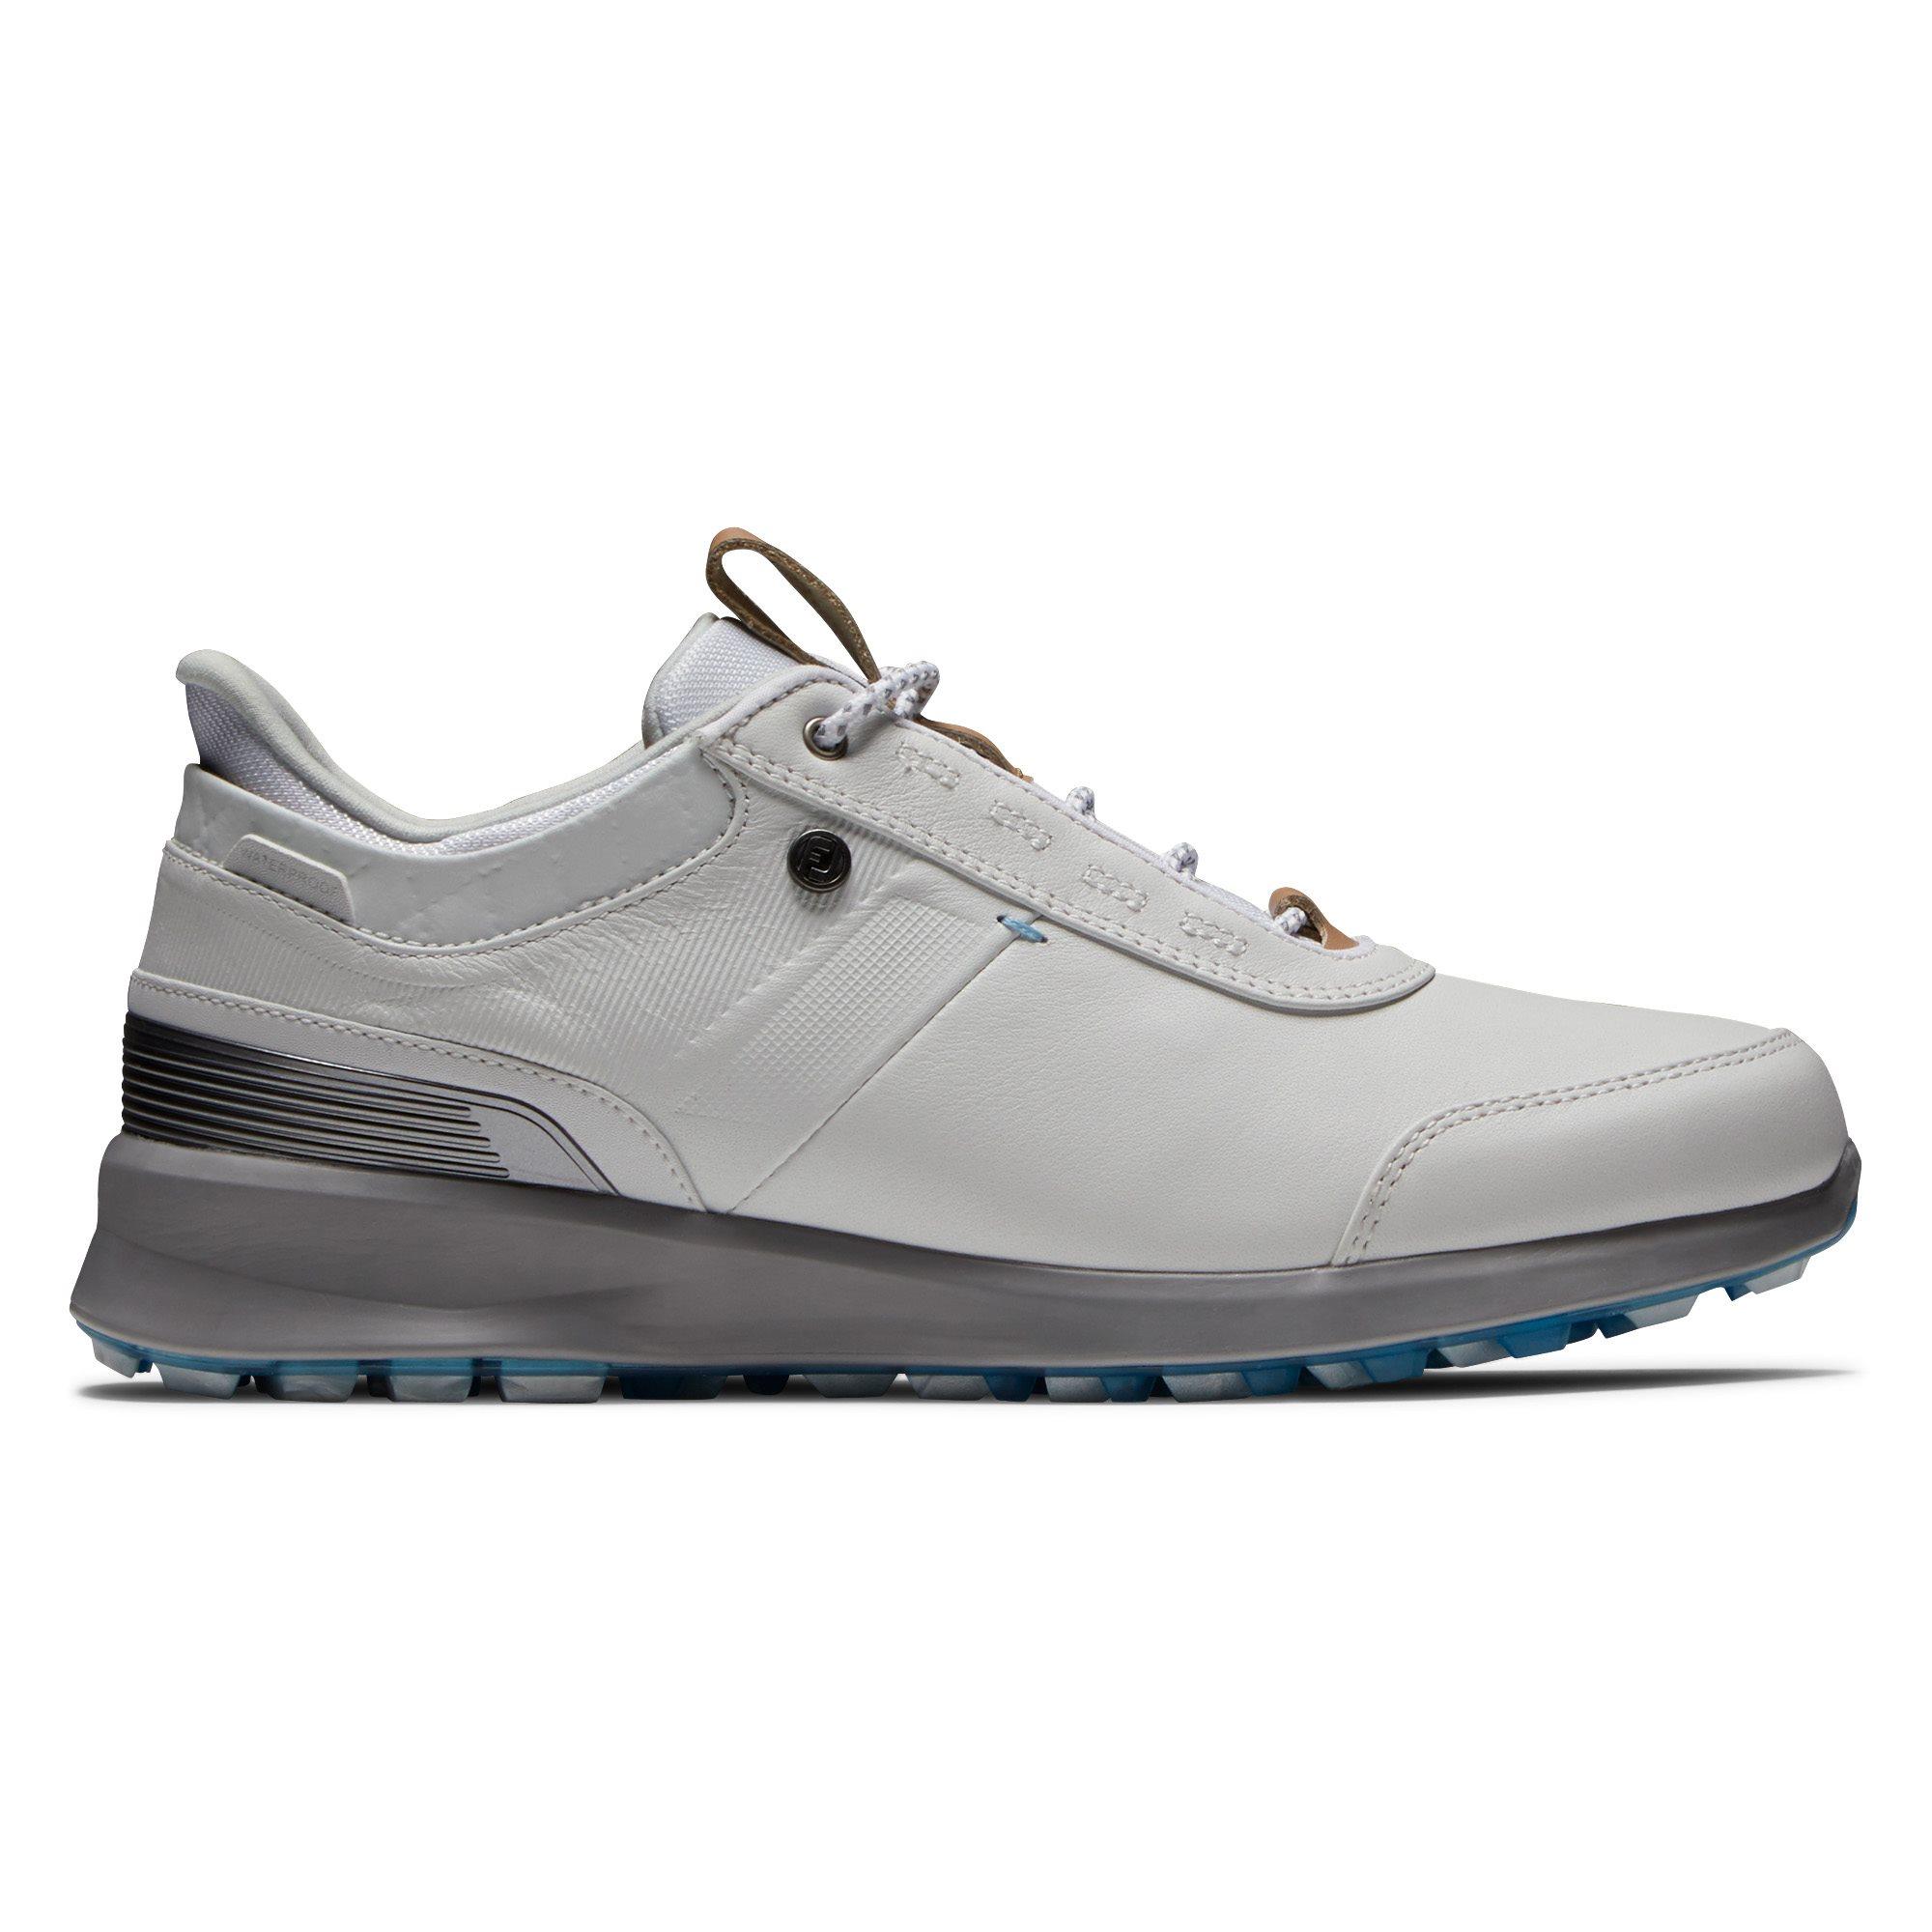 FootJoy dames golfschoenen Stratos wit-grijs